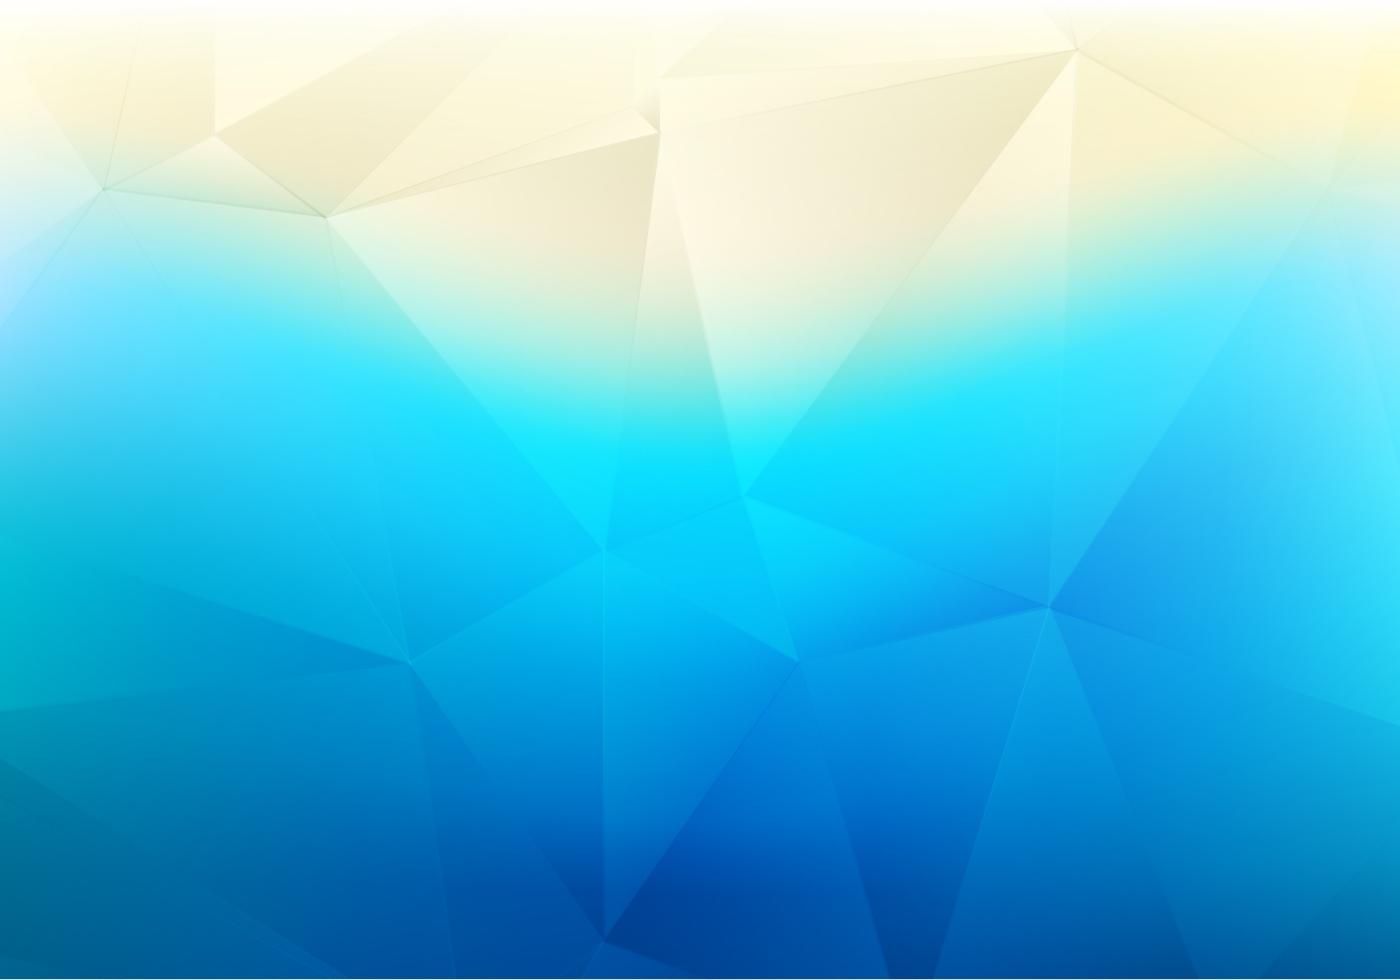 Vector Blue Degraded Background